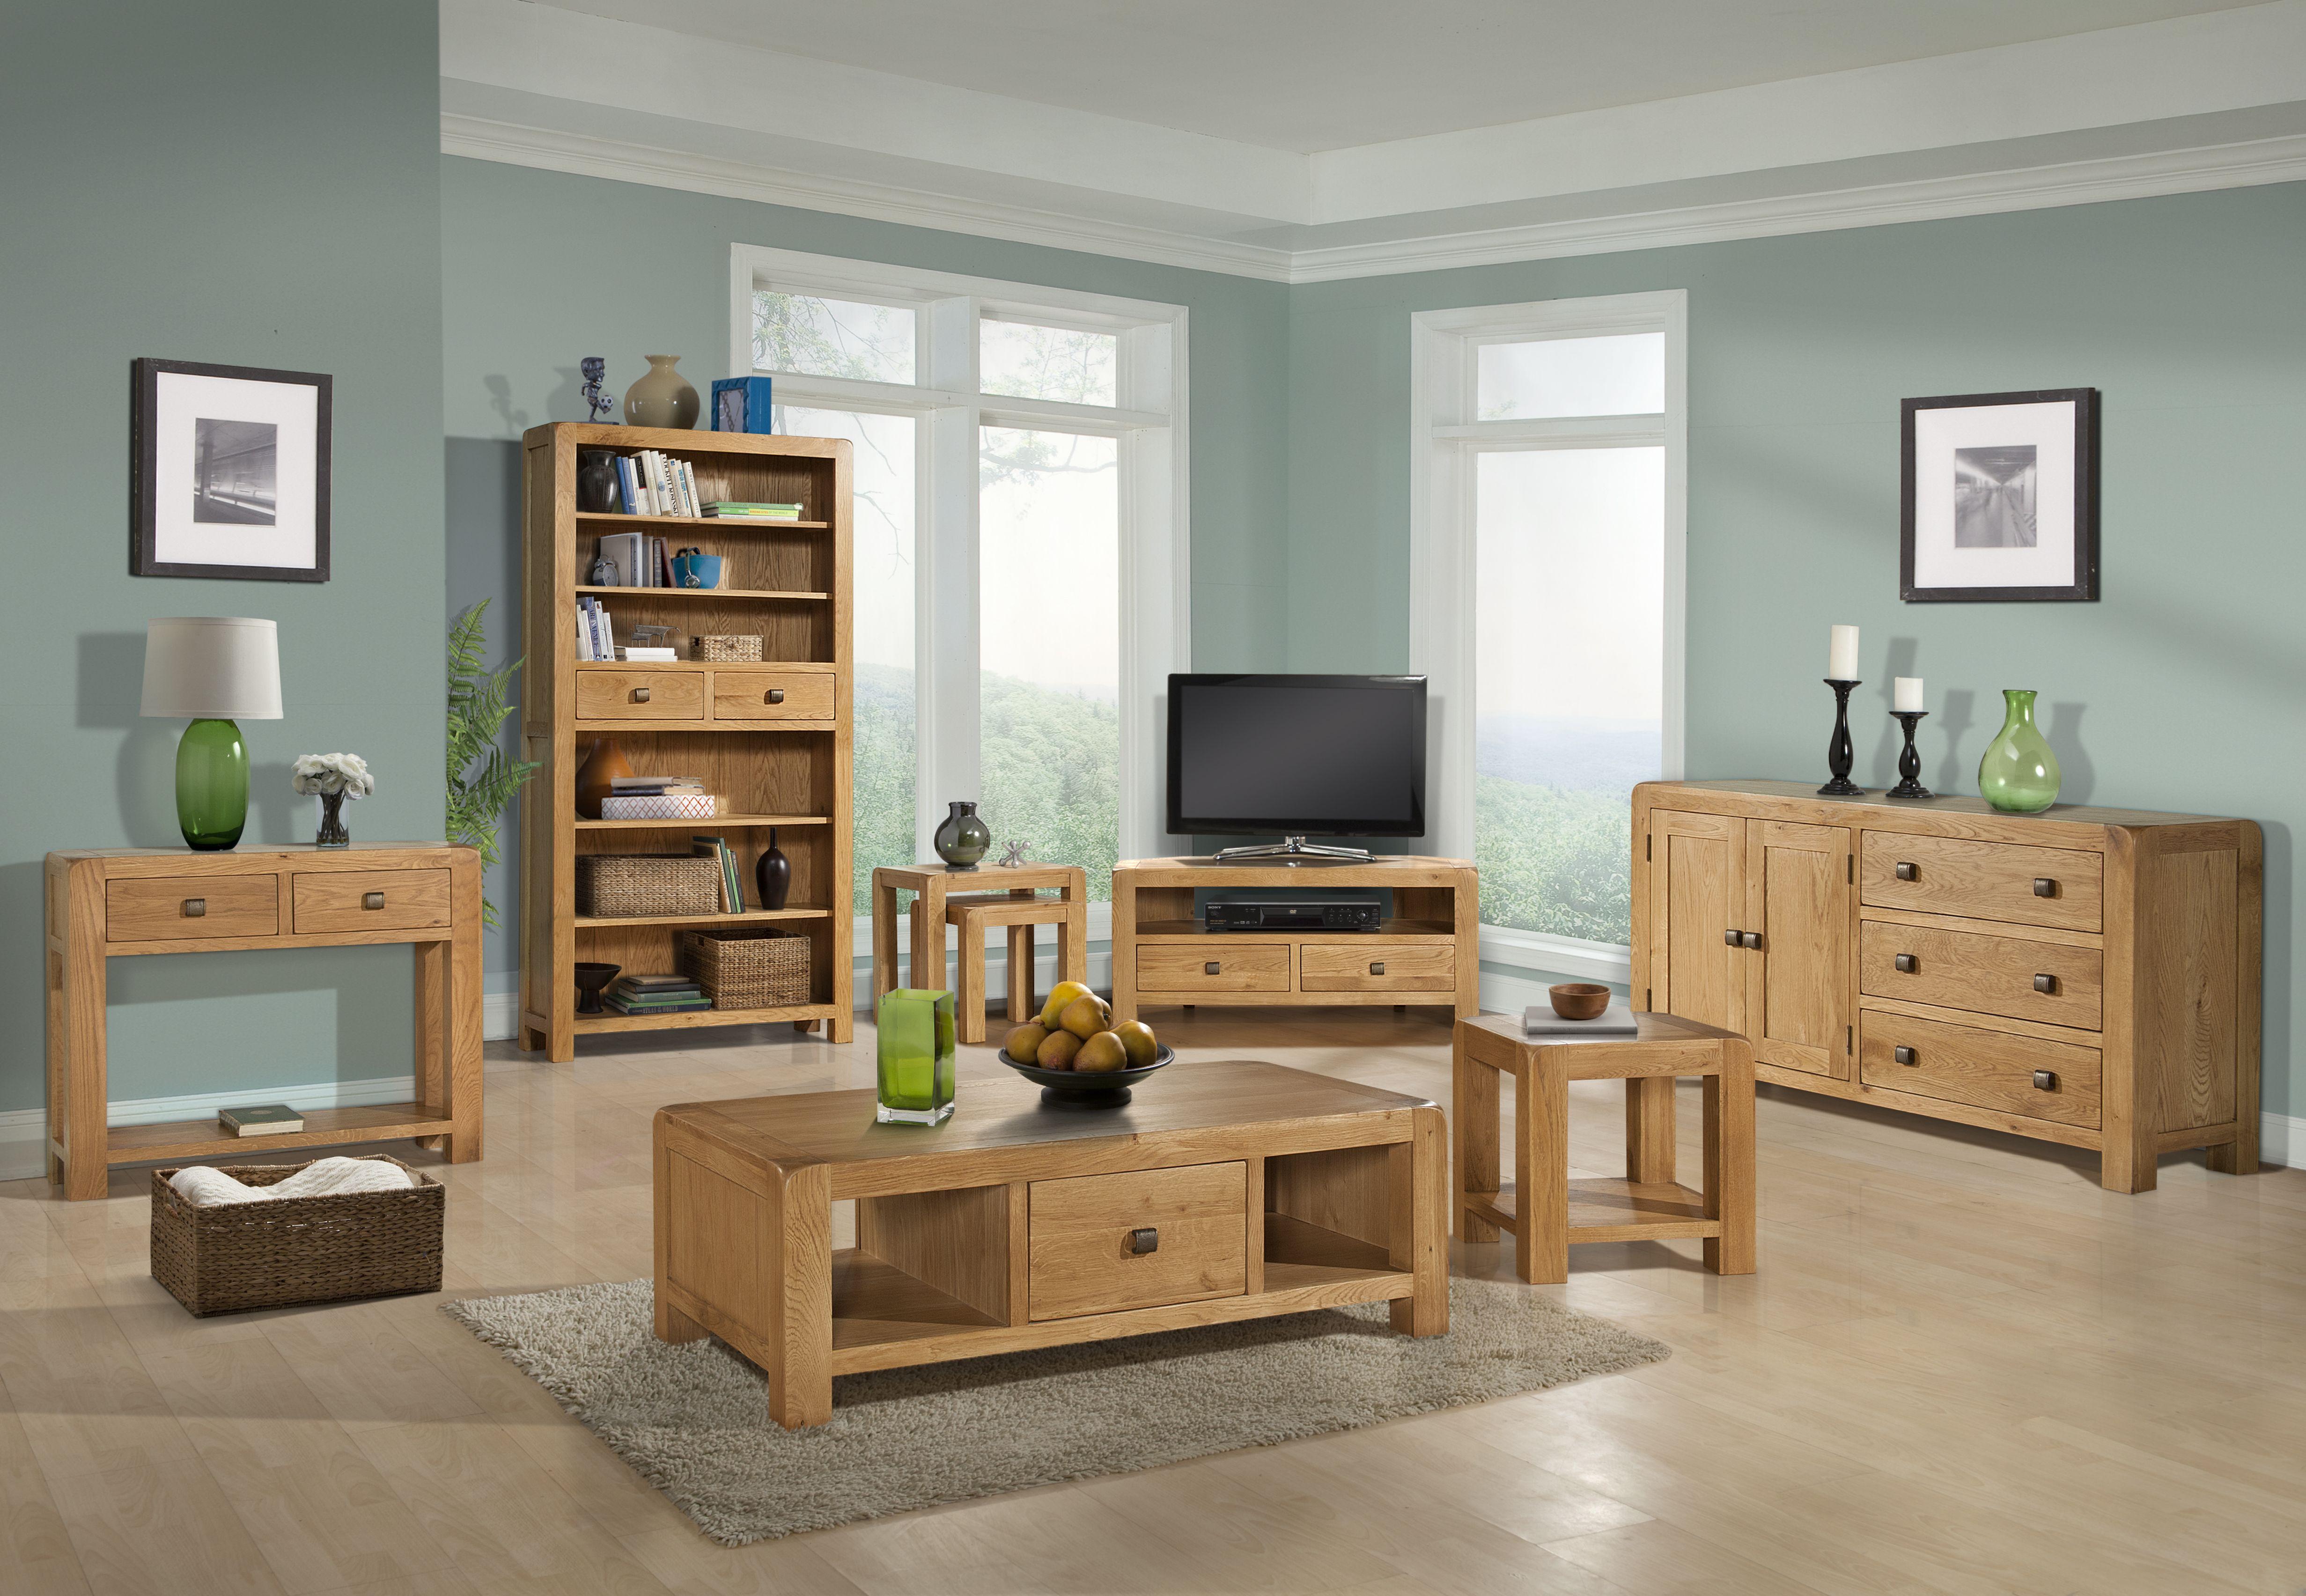 Furniture Specialist In Suffolk About Edmunds Clarke Oak Furniture Living Room Living Room Furniture Sale Furniture Design Wooden